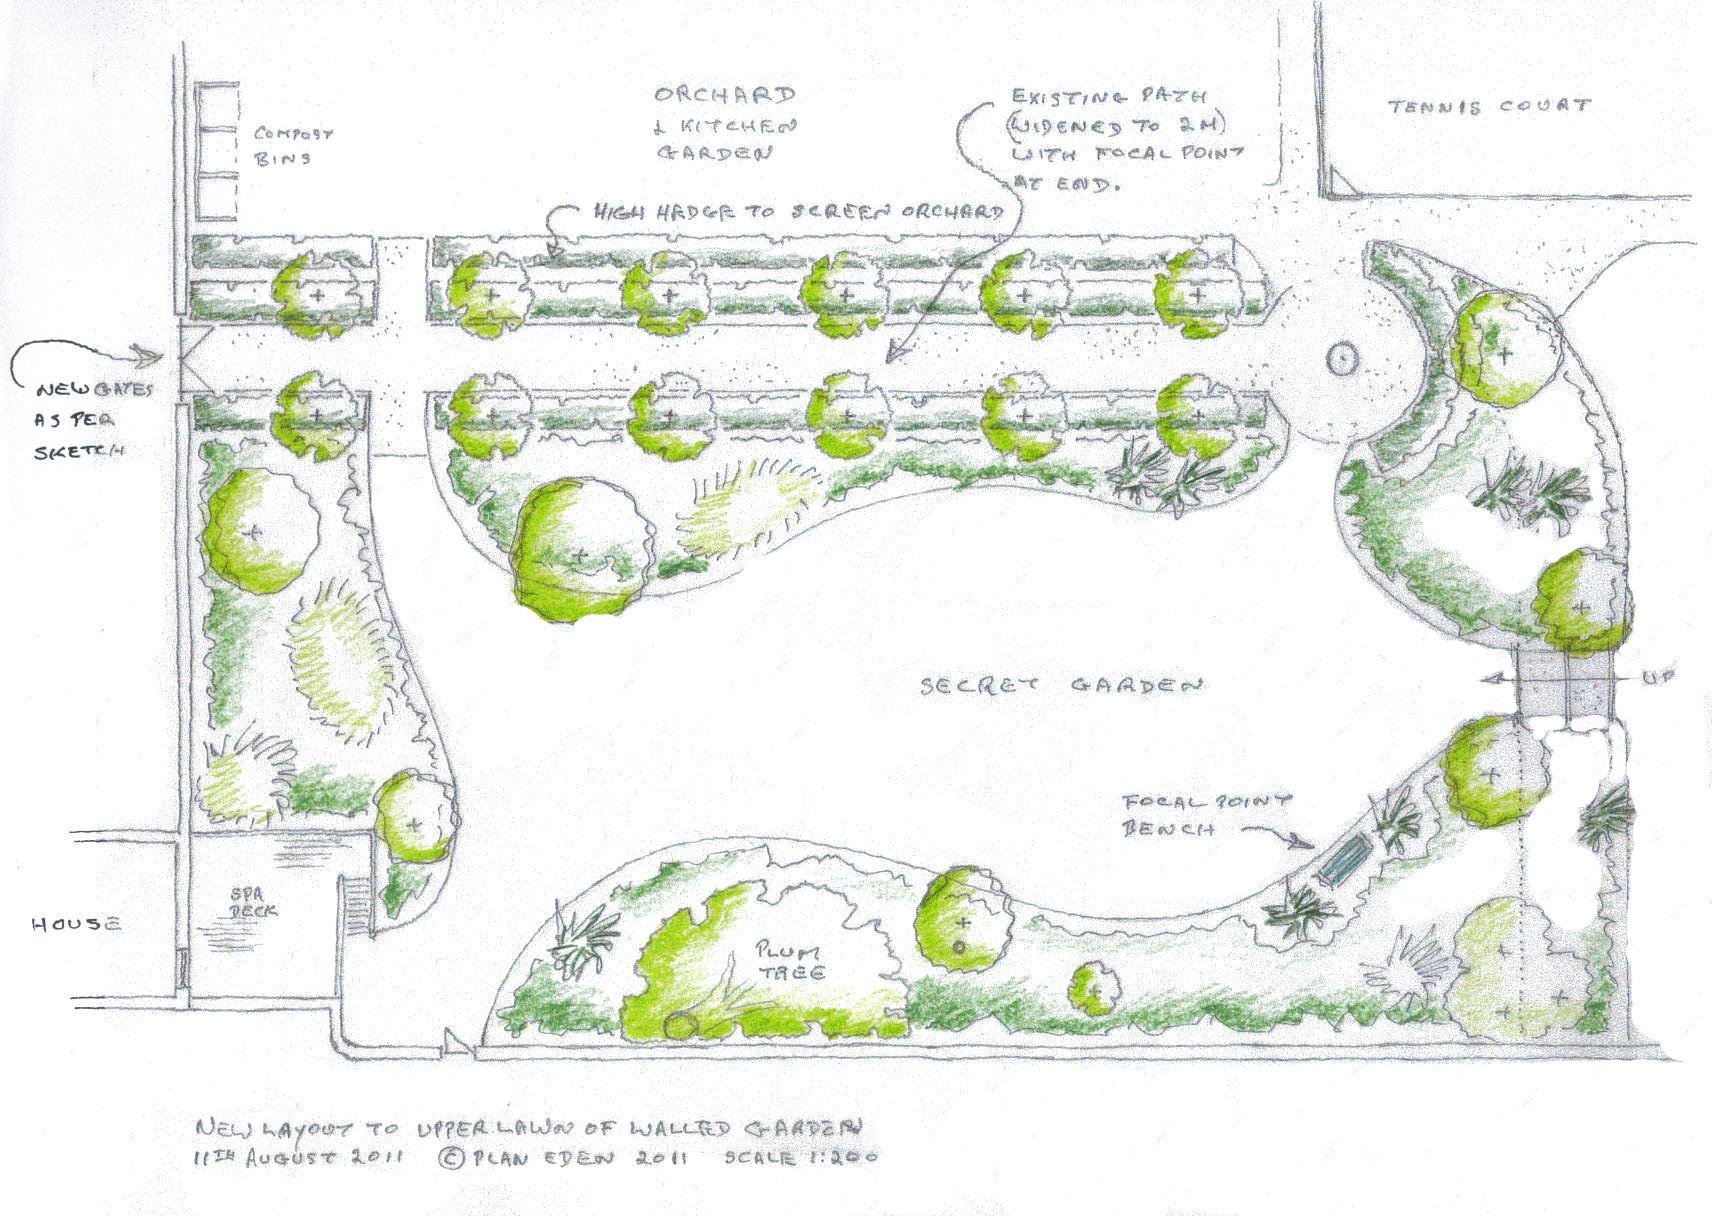 Garden Design Sketch Plan Plan Sketch Eden Design Design Sketch